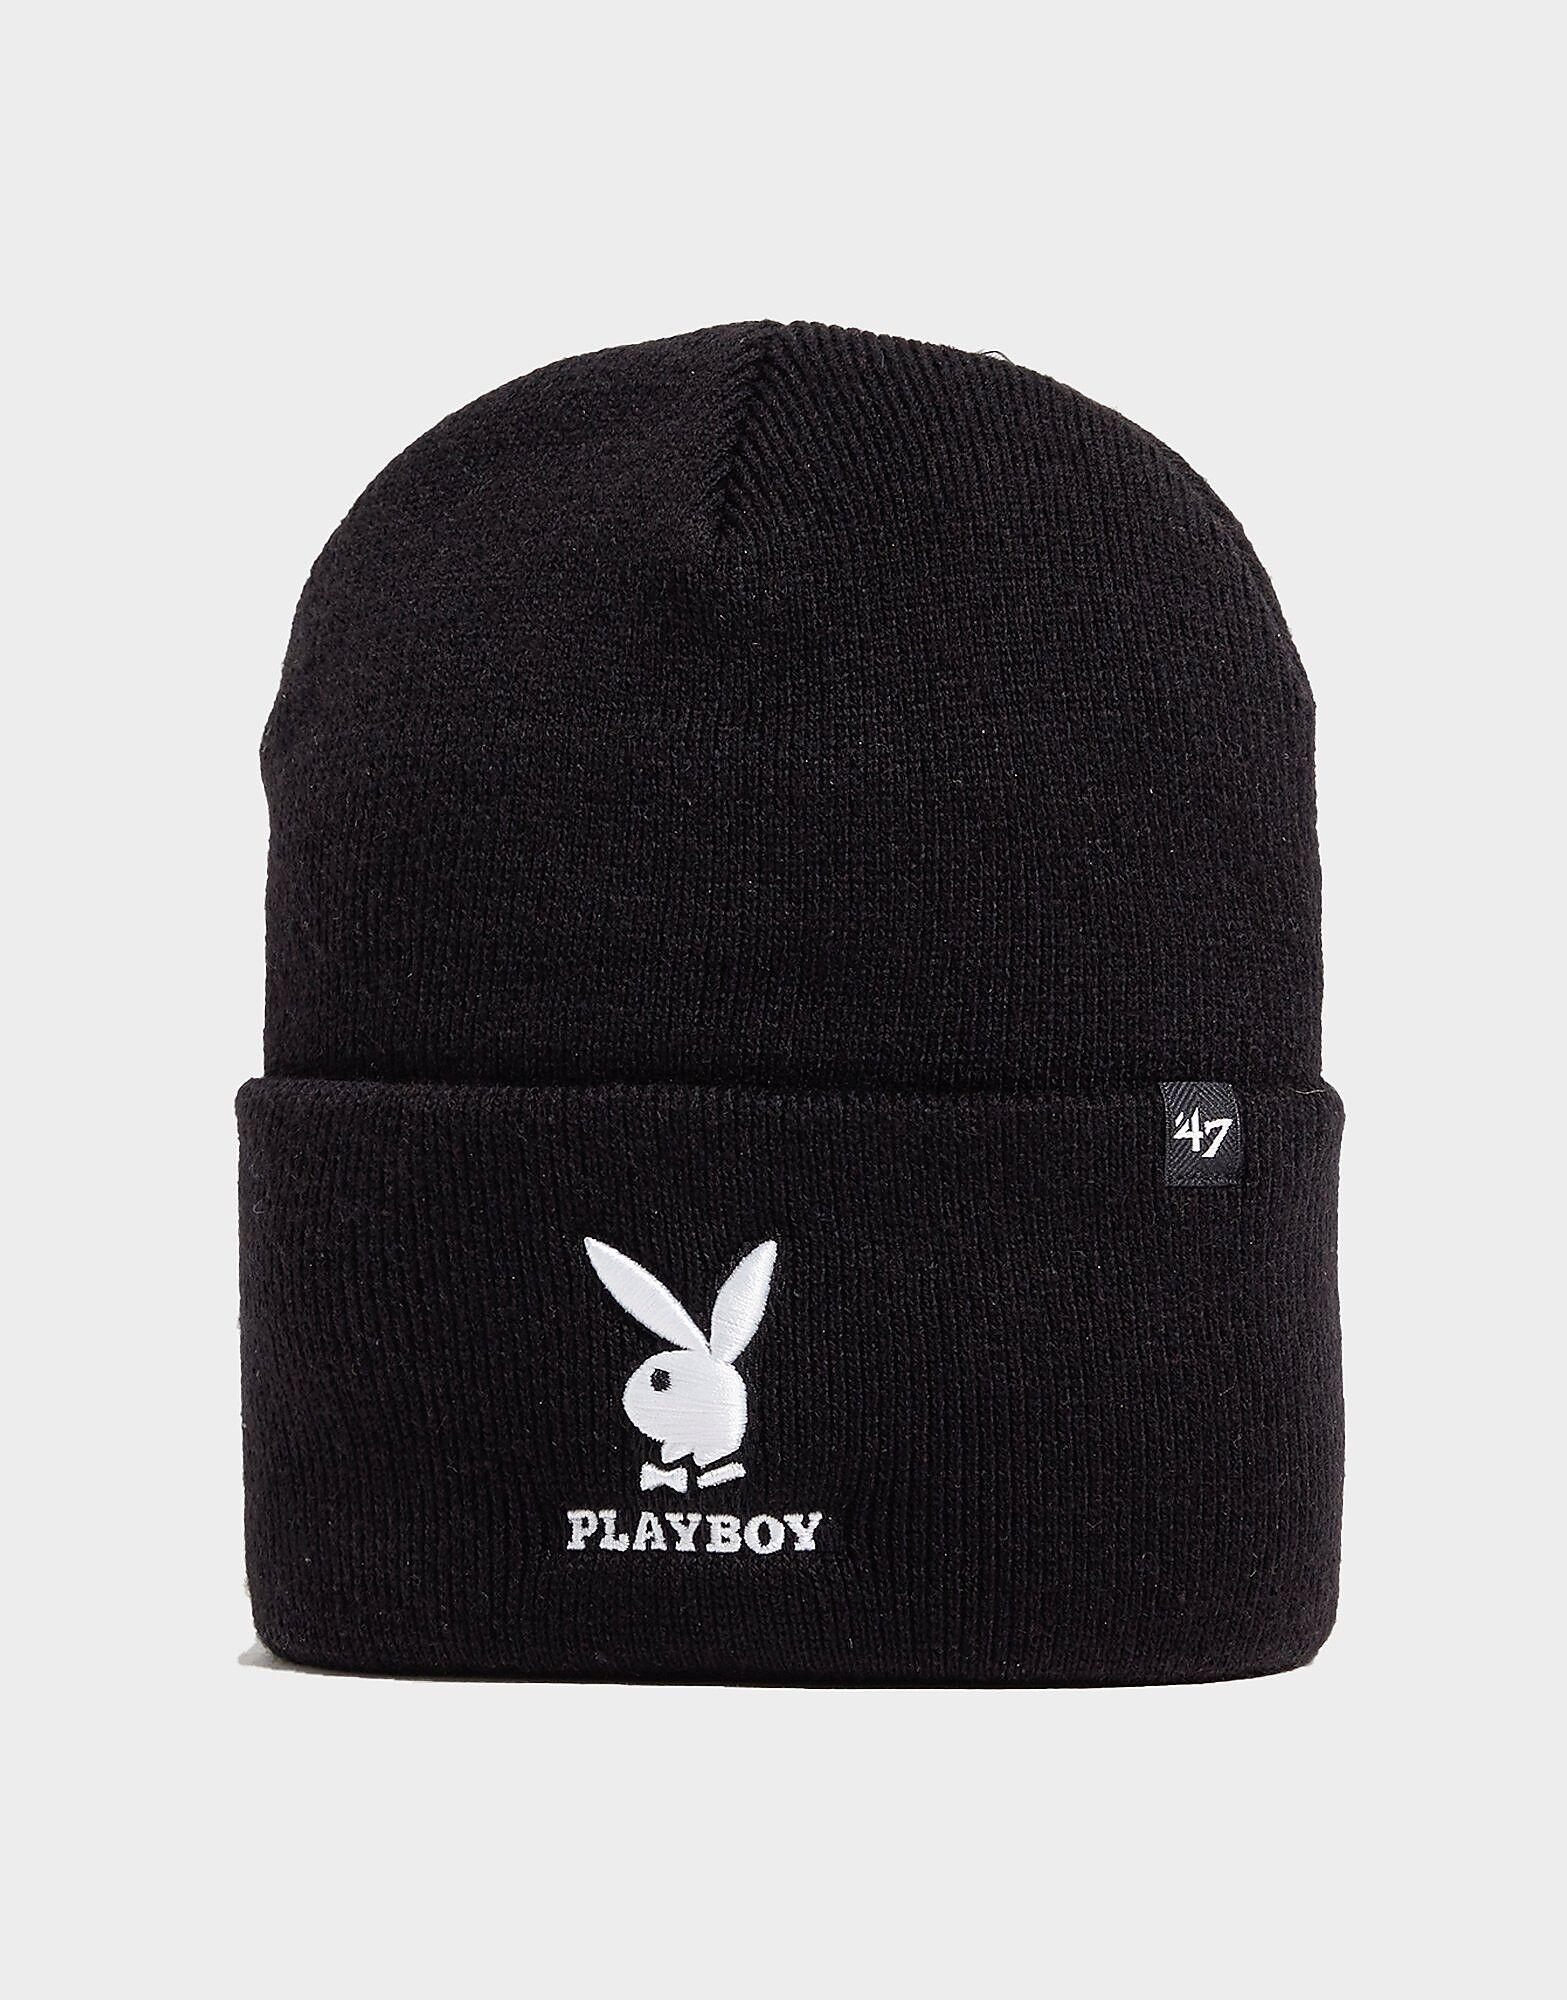 47 Brand Playboy Pipo - Mens, Musta